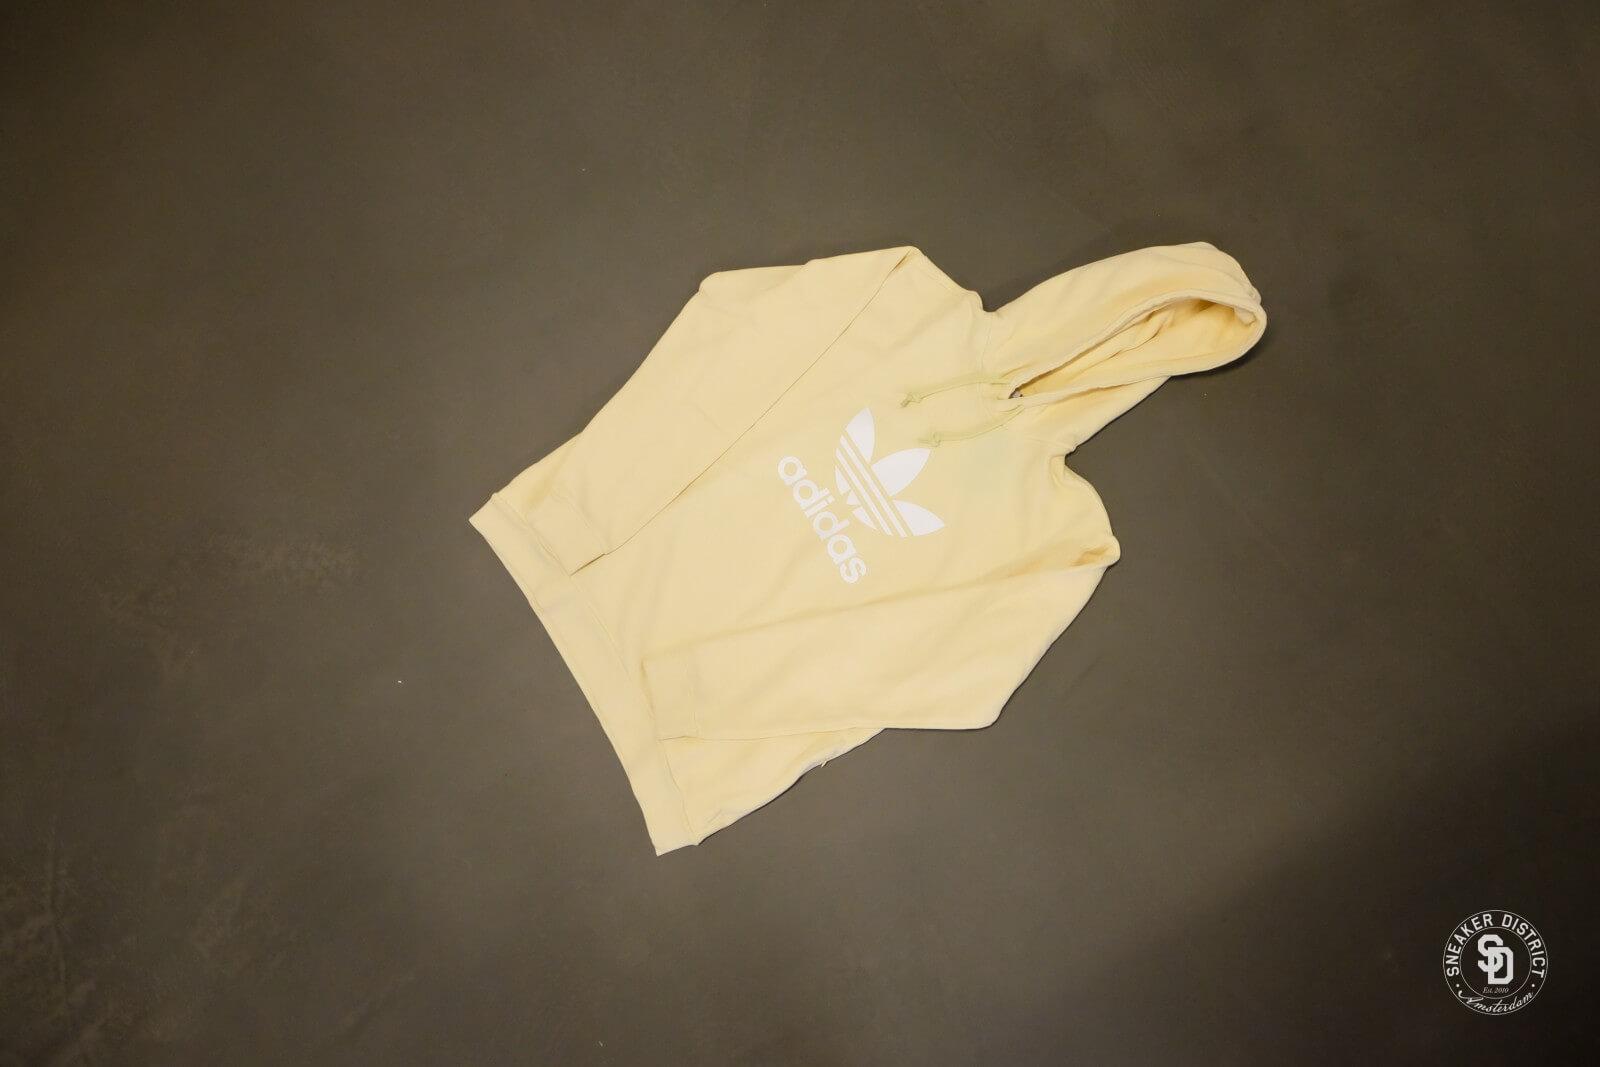 Adidas Trefoil Warm Up Hoodie Mist Sun CW1243